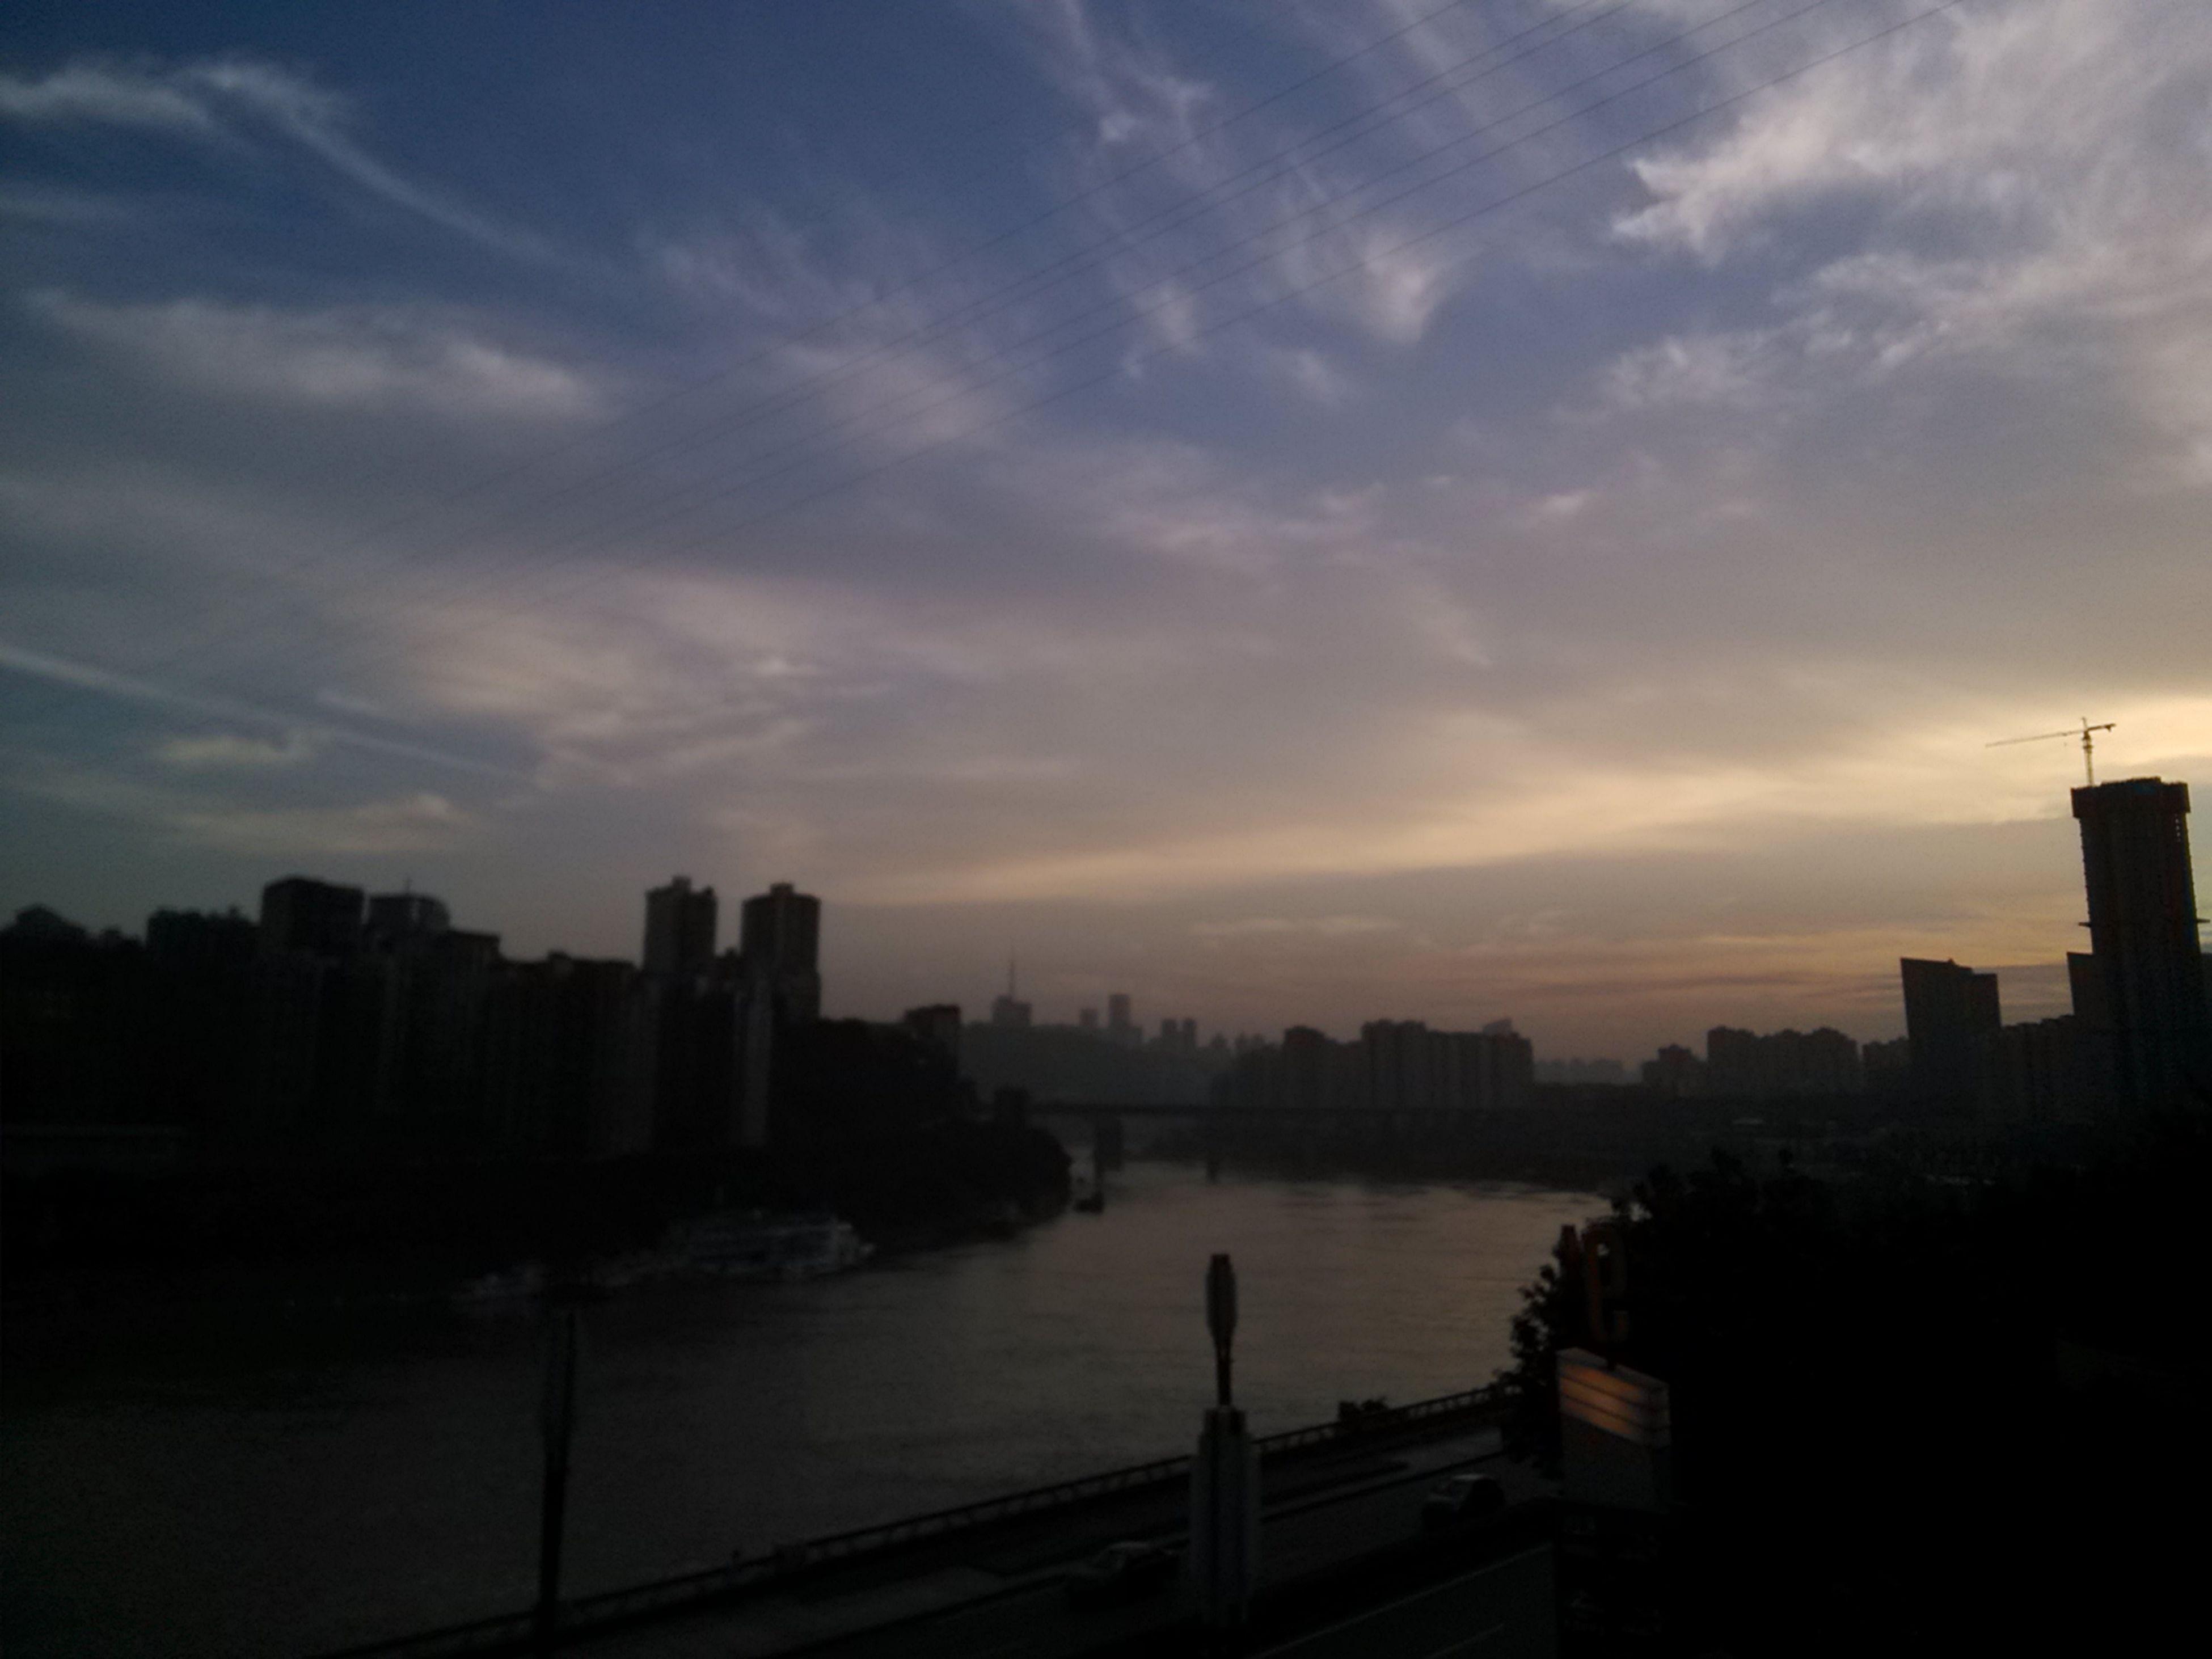 building exterior, architecture, built structure, sky, water, sunset, city, silhouette, cityscape, river, cloud - sky, cloud, skyscraper, scenics, urban skyline, reflection, lake, nature, outdoors, building